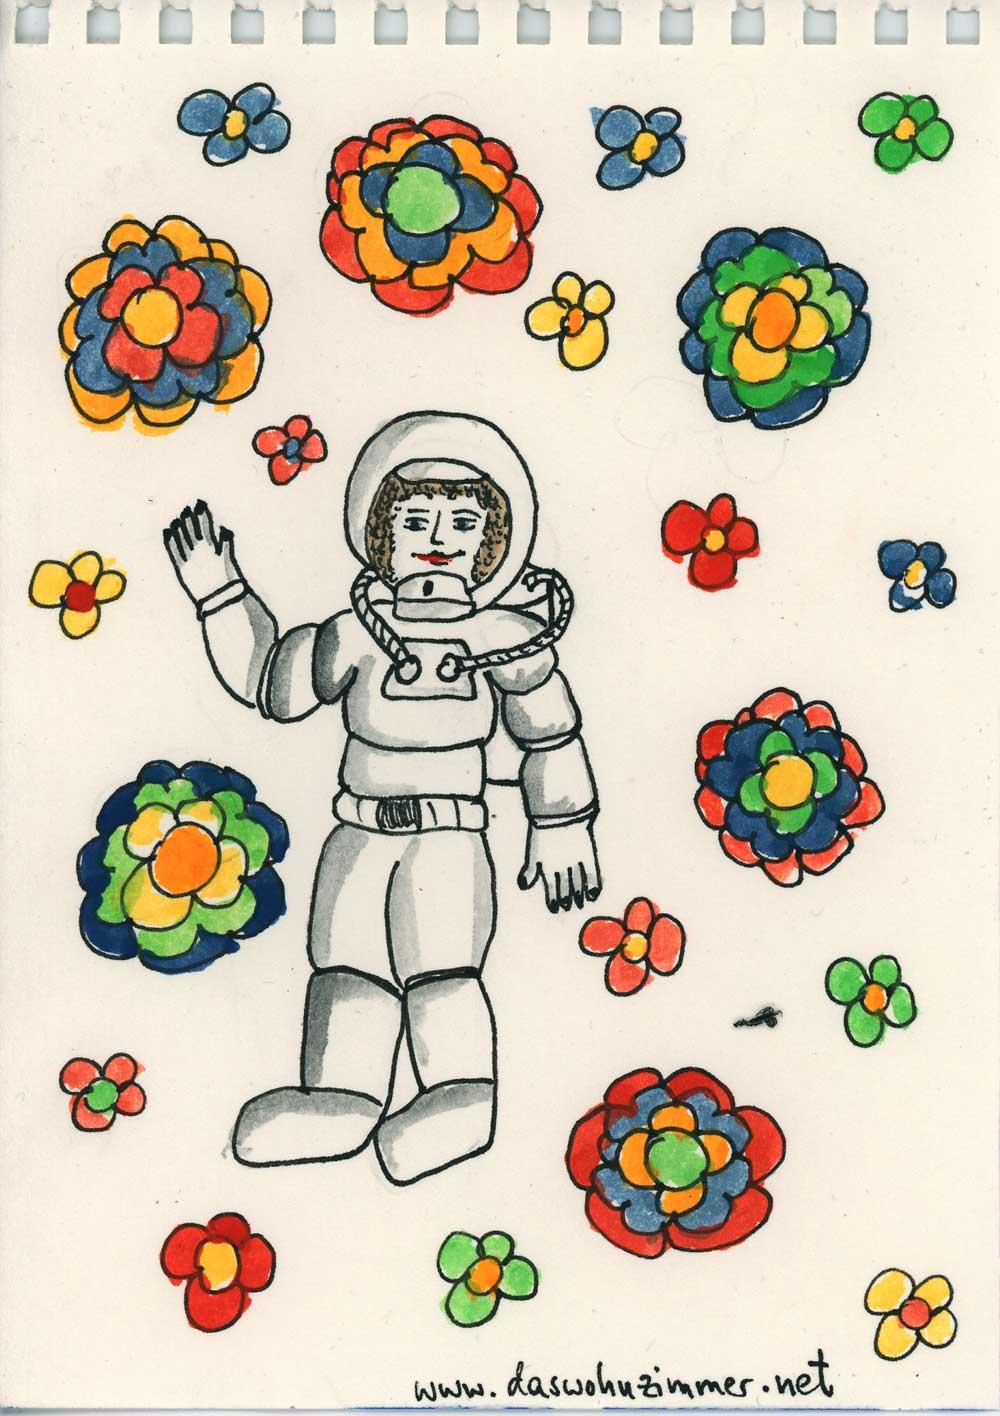 Be Creative #26 - Astronaut, © Ines Häufler, 2011